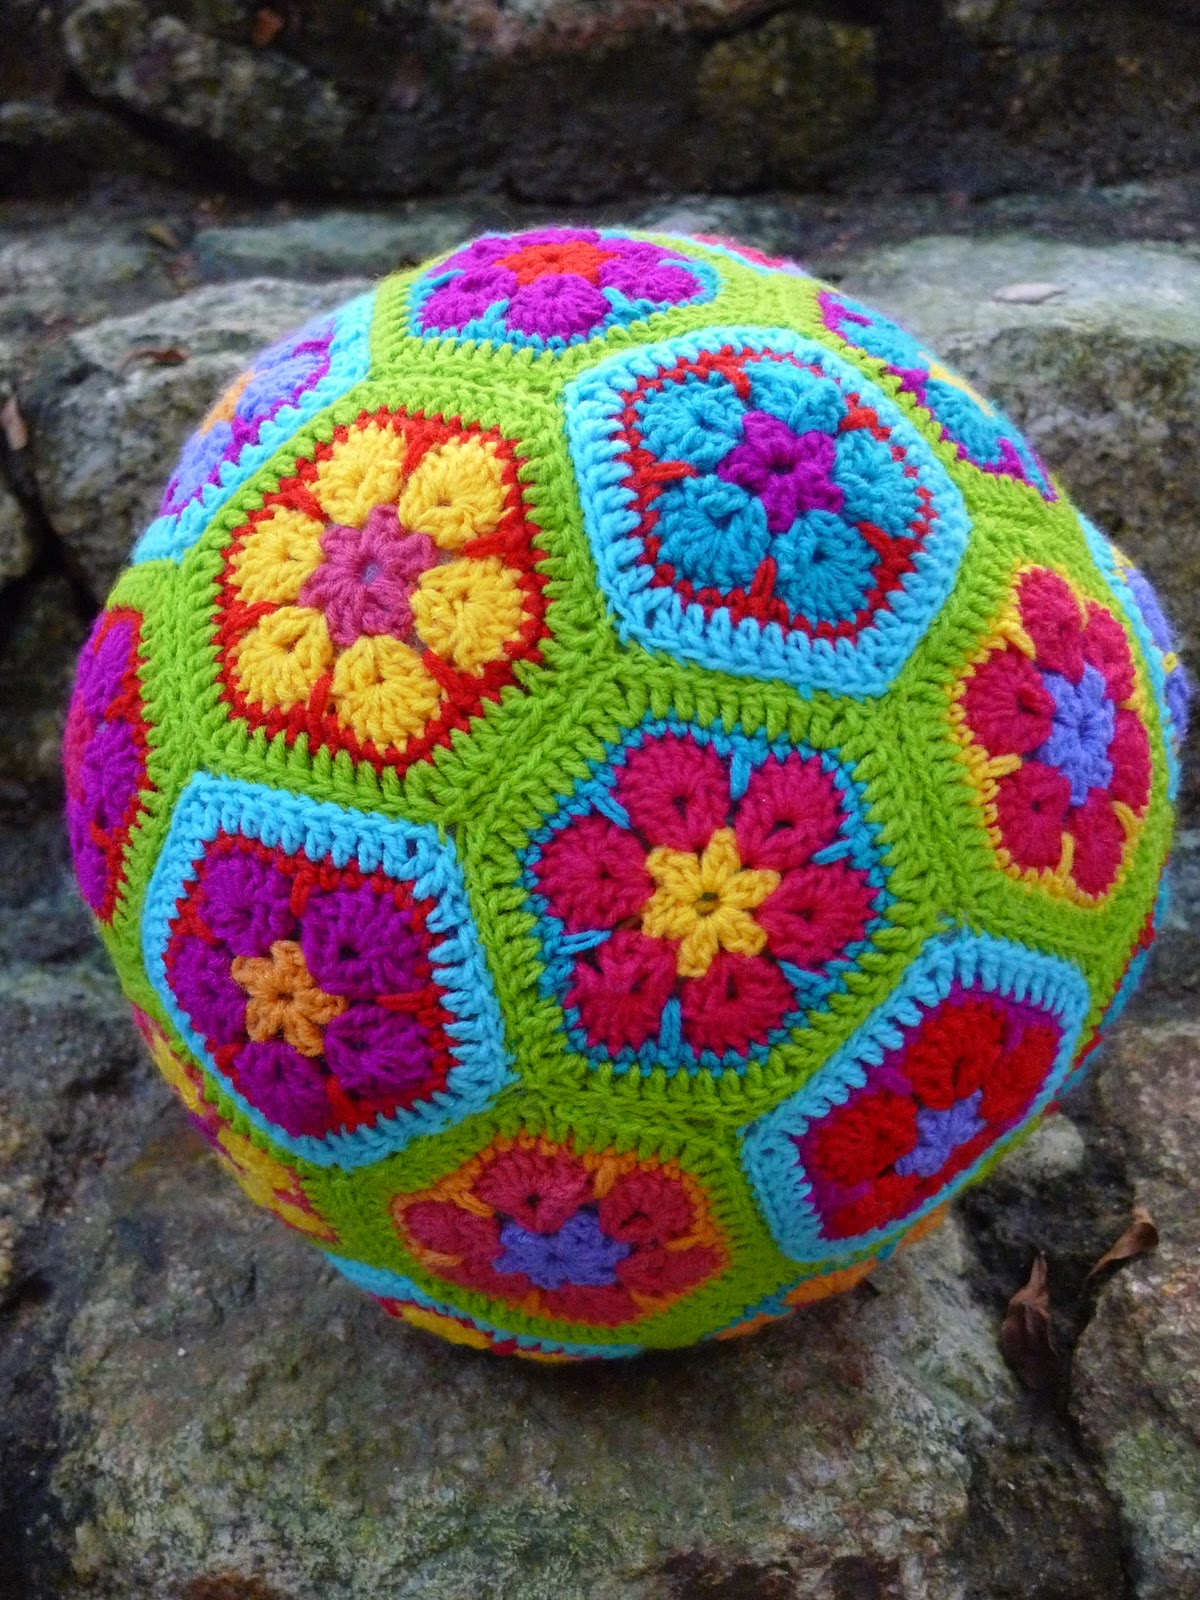 pigtails: Hexagon & Granny\'s Soccer Ball Cushion and Handbag